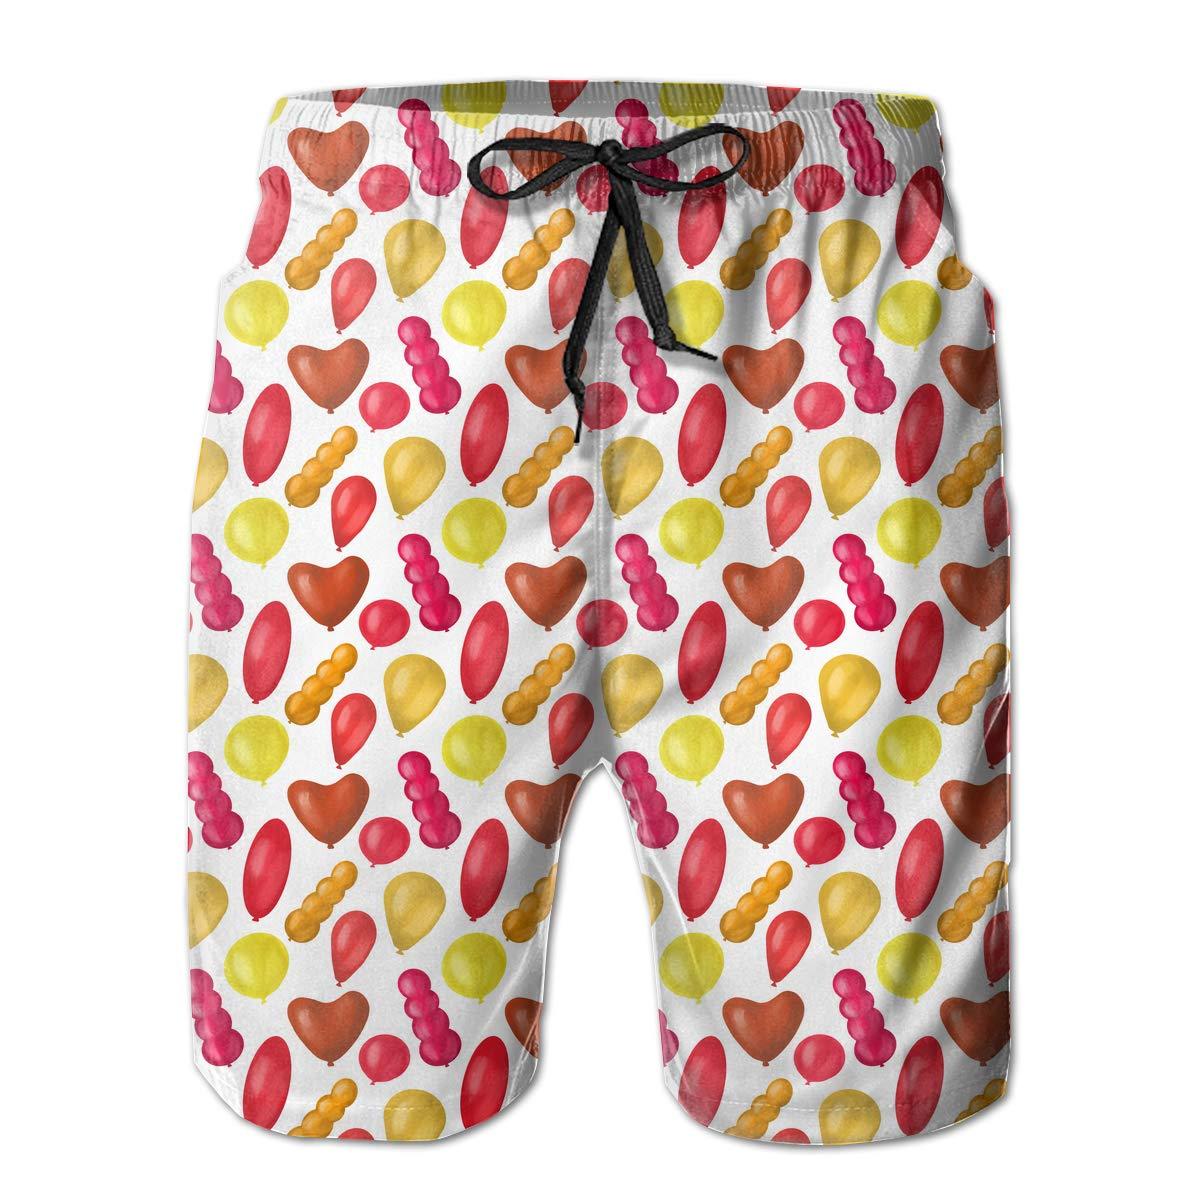 STDKNSK9 Mens Colorful Balloon Pattern Board Shorts Beach Pants